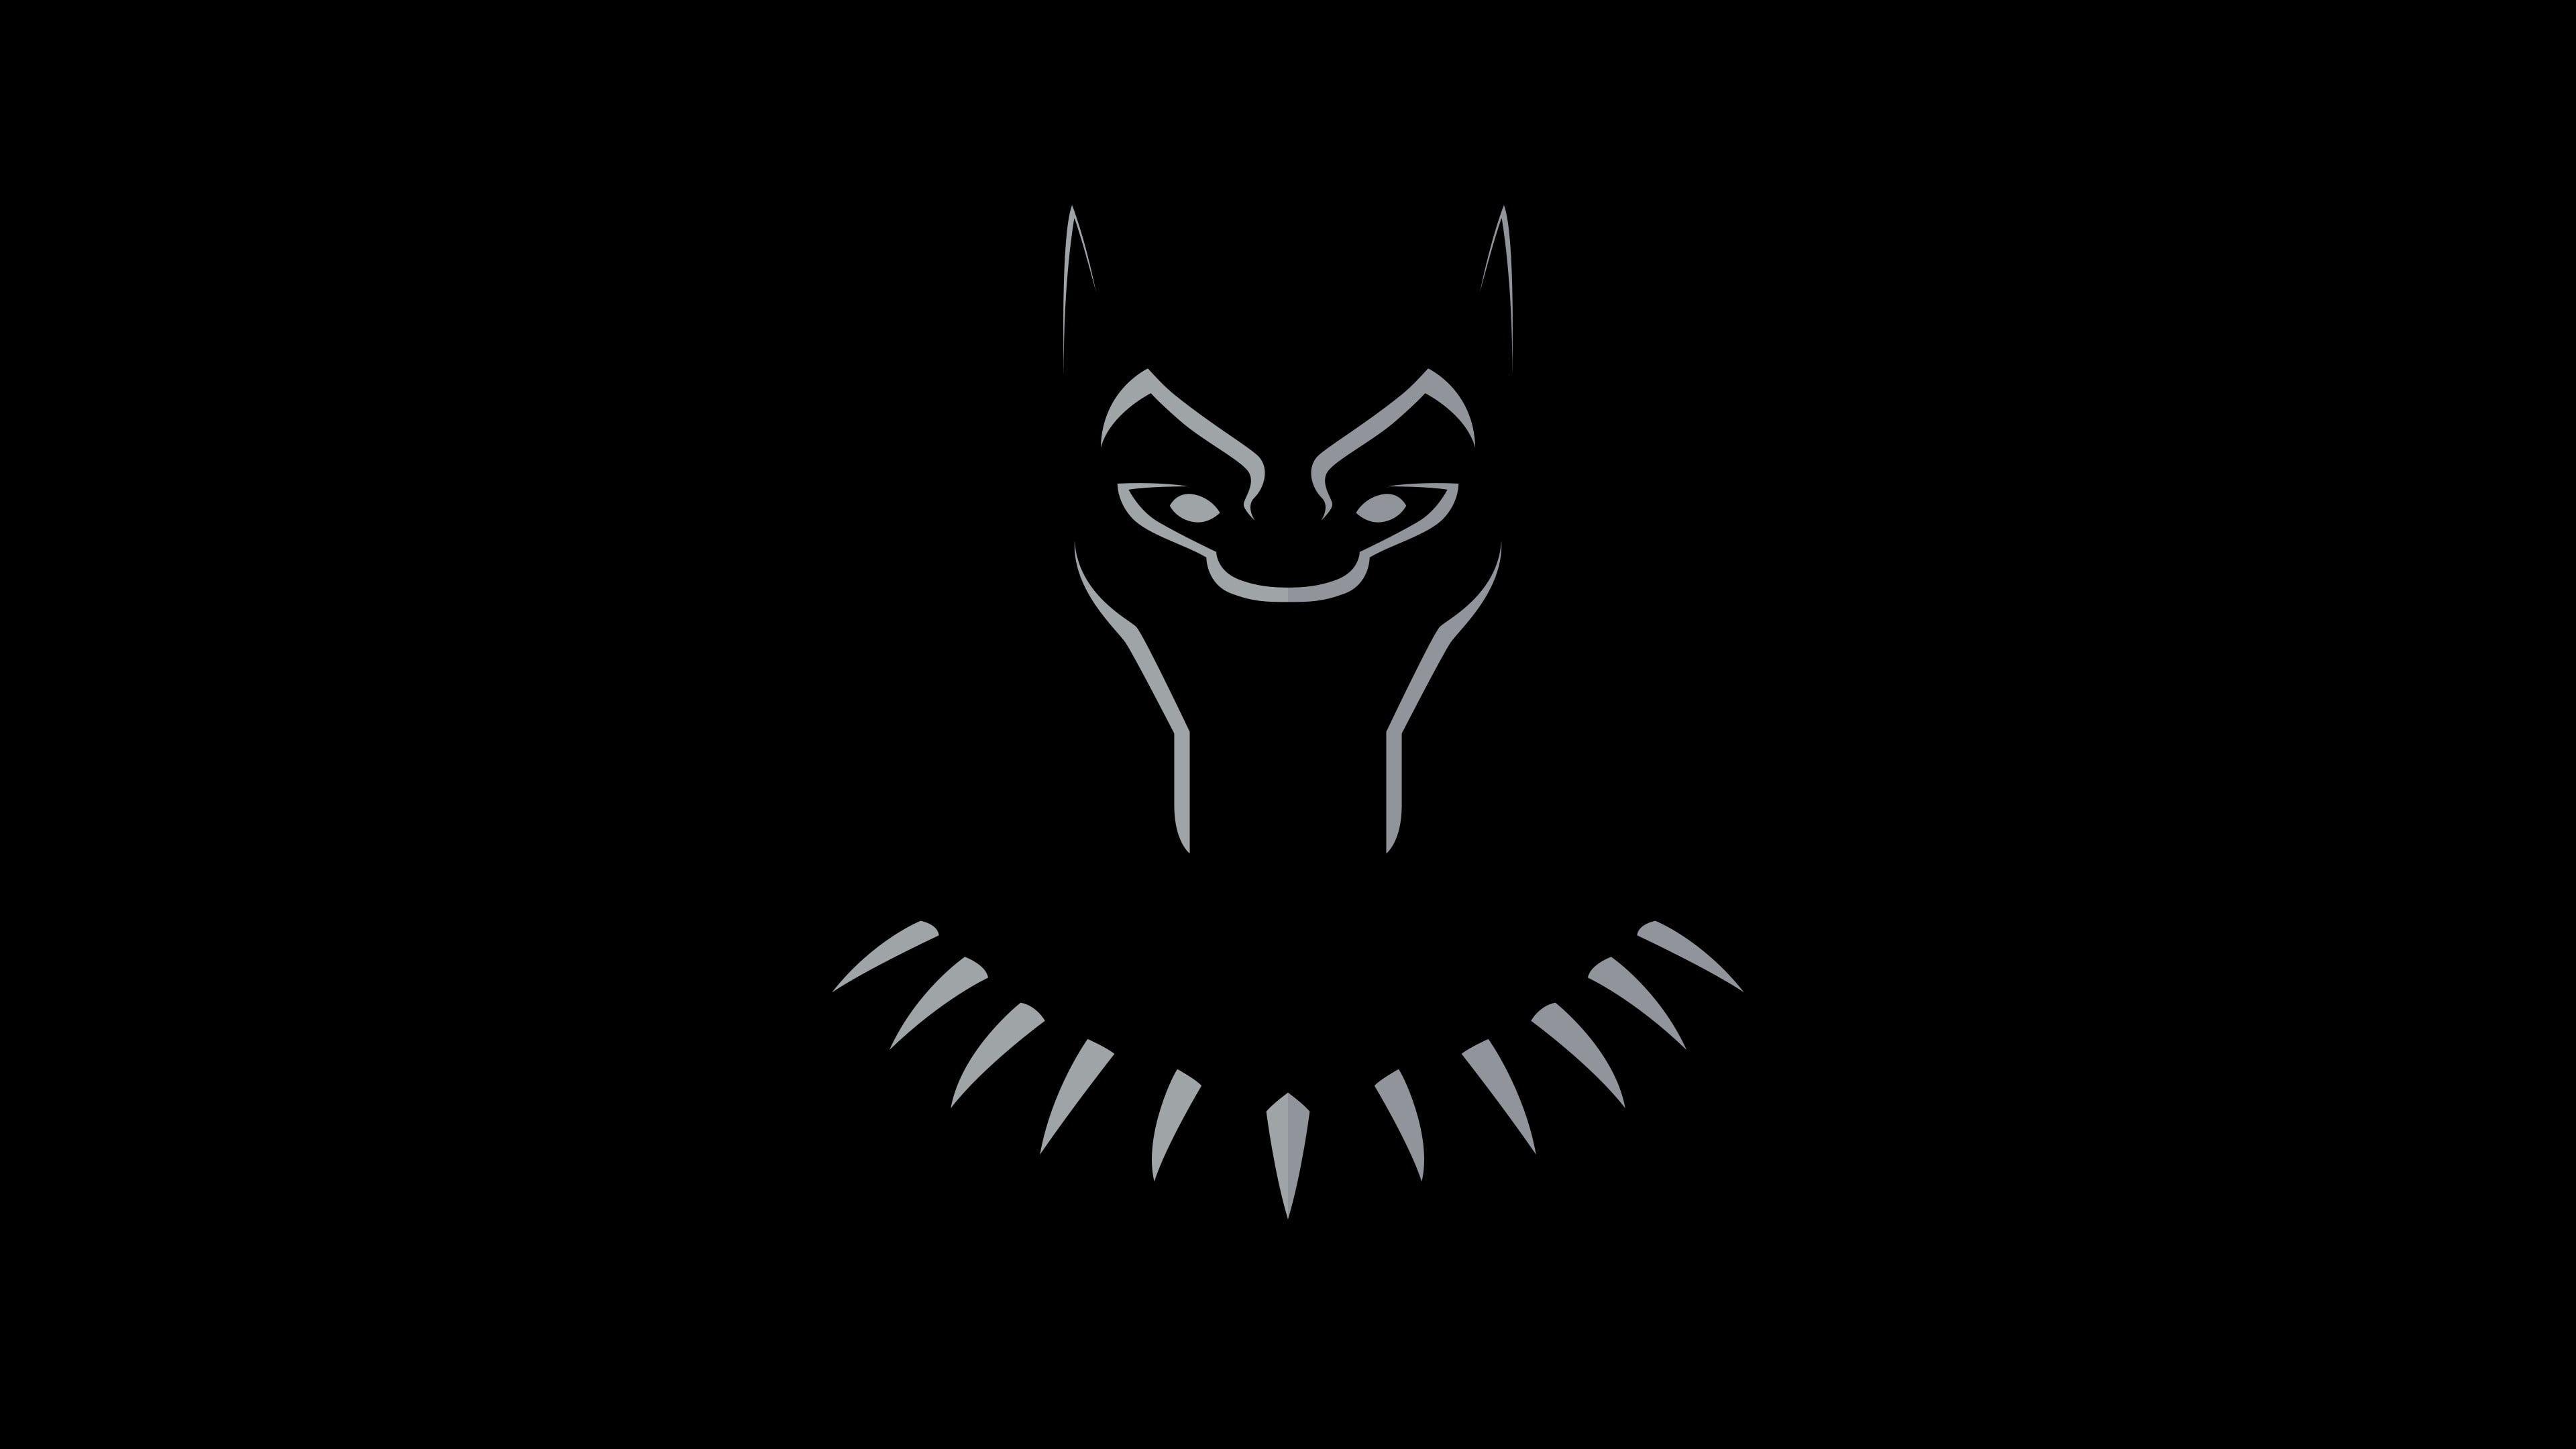 Black Panther Flat Digital Art 4k Wallpaper Hdwallpaper Desktop Black Panther Black Panther Art Black Panther Hd Wallpaper